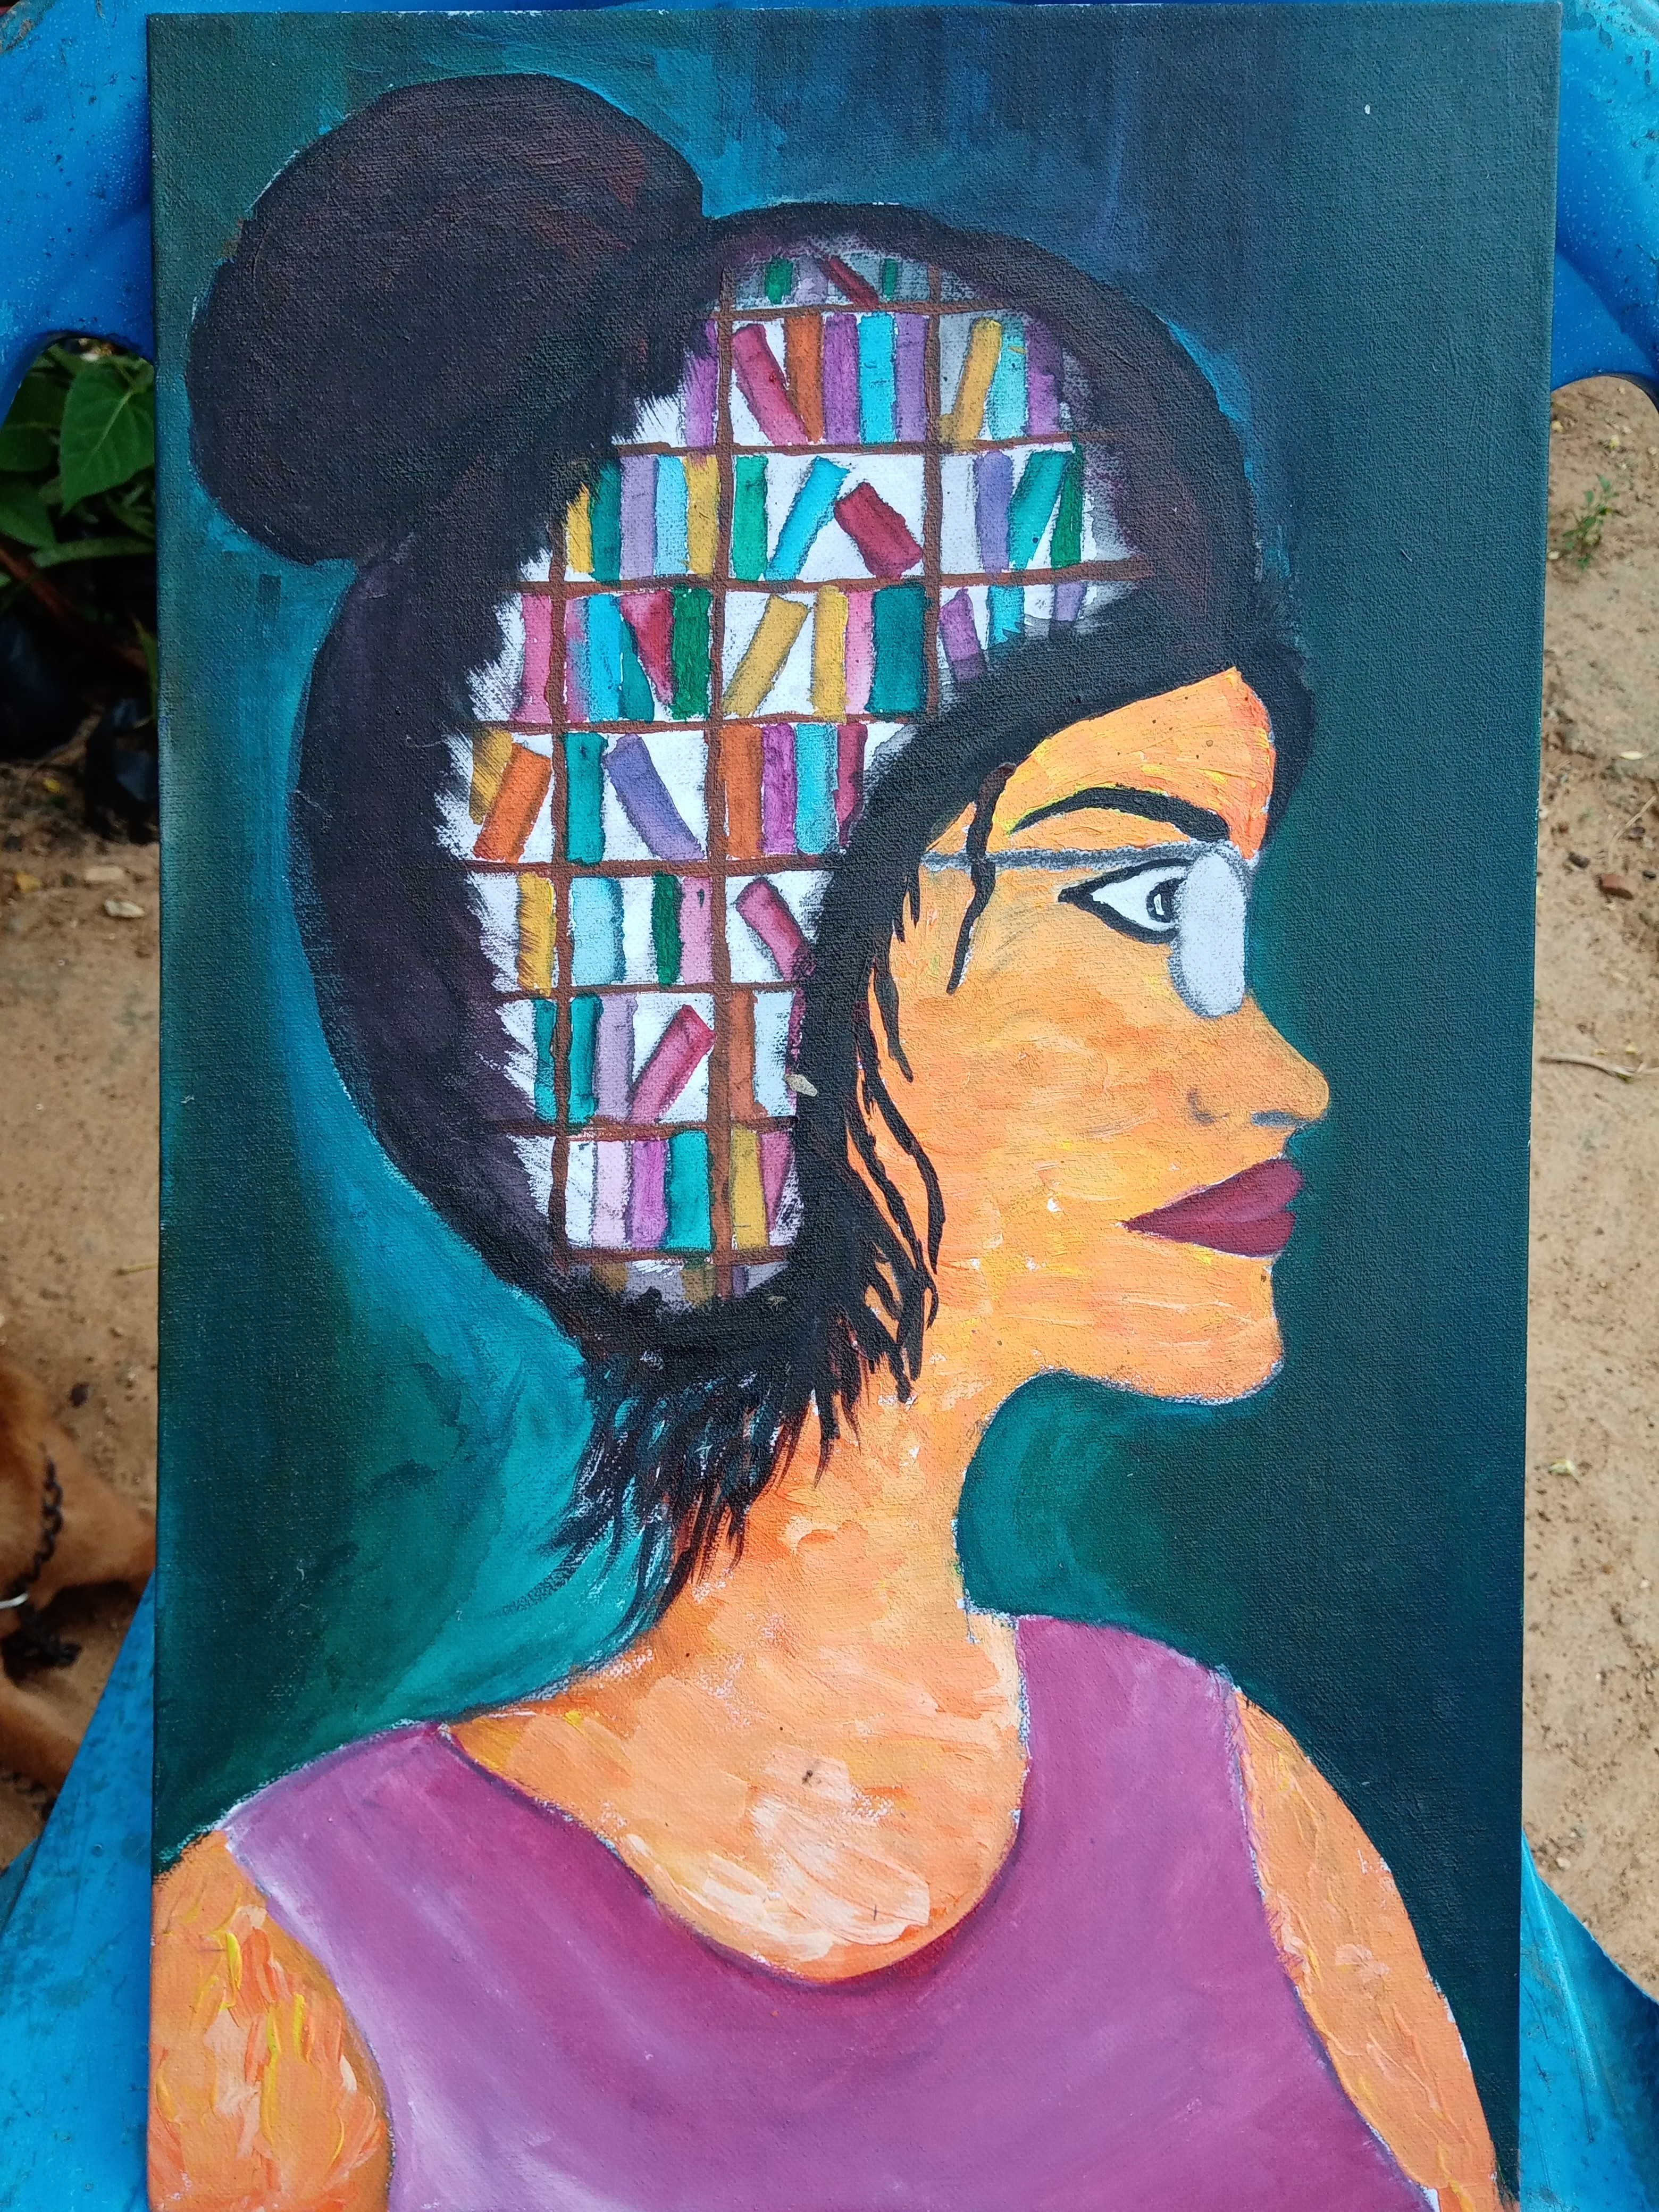 Strength of a girl by Arthana Pushpalingam